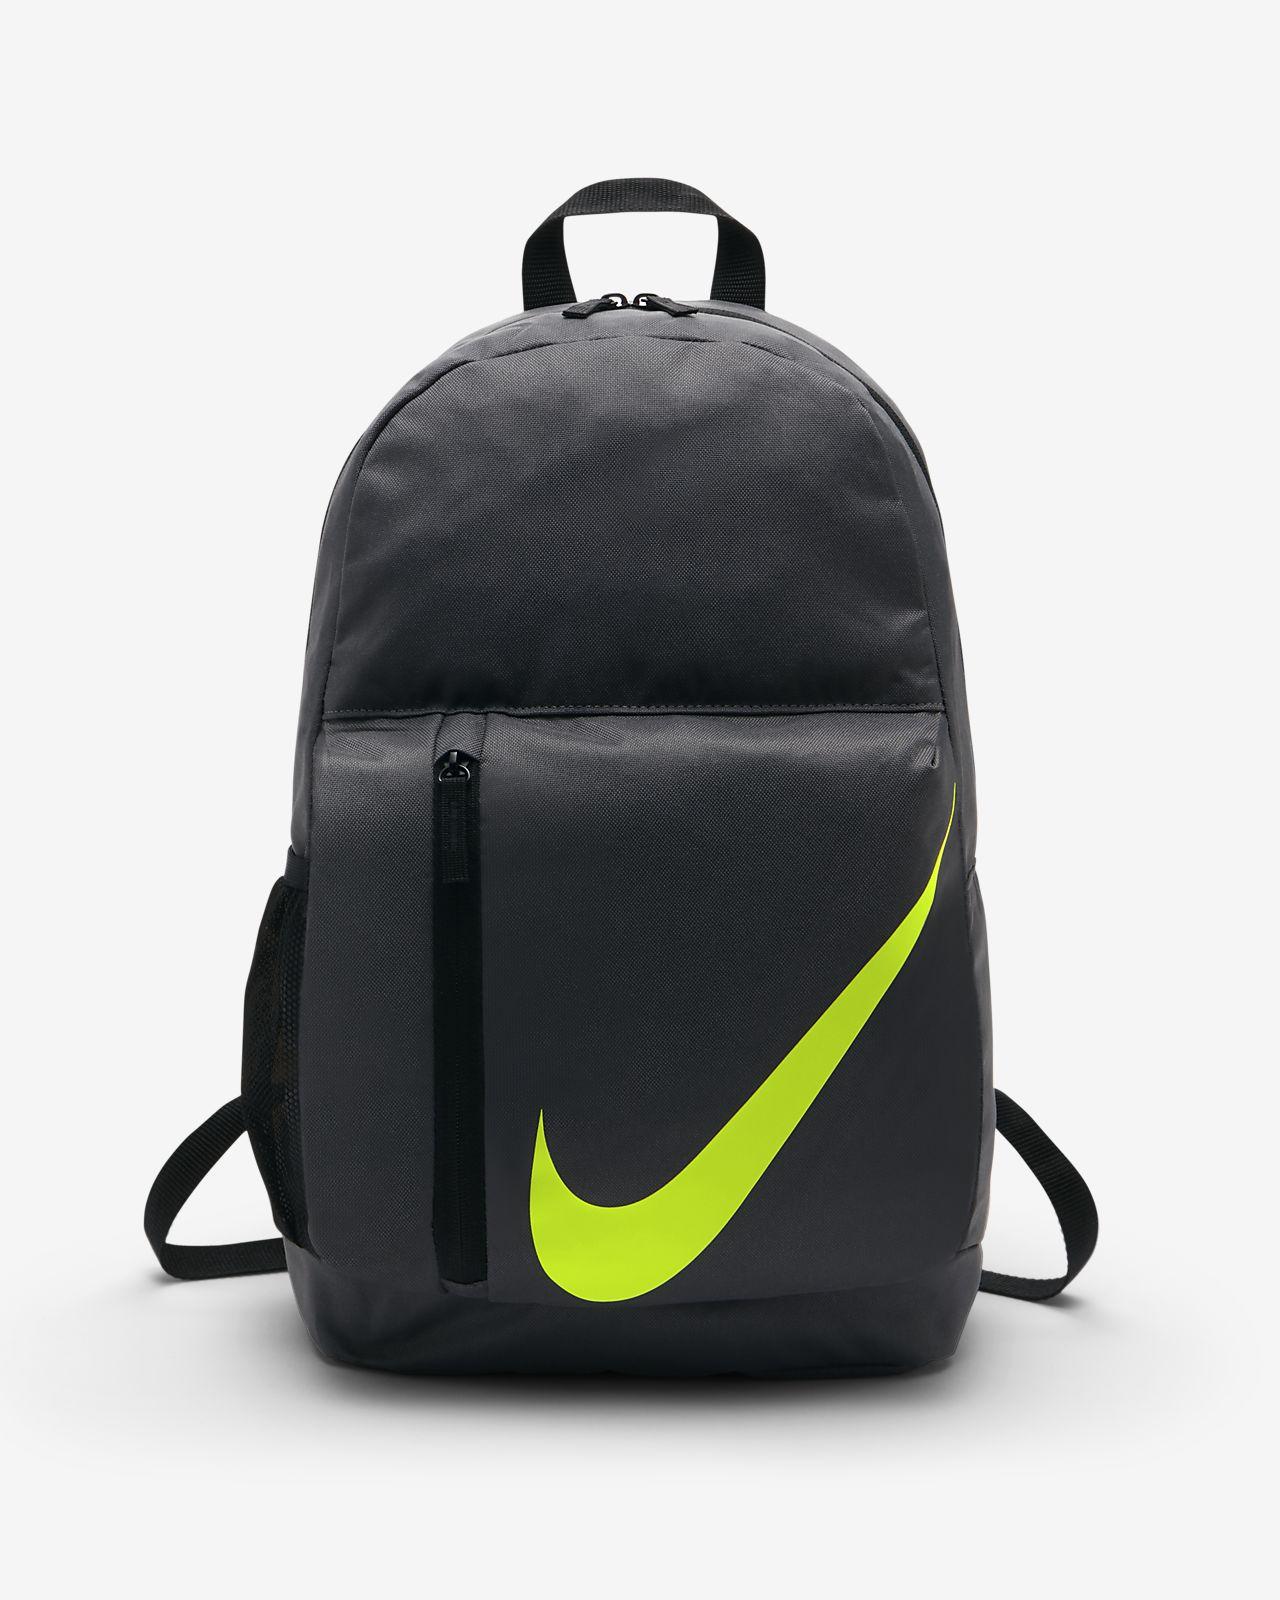 nike backpack online shopping